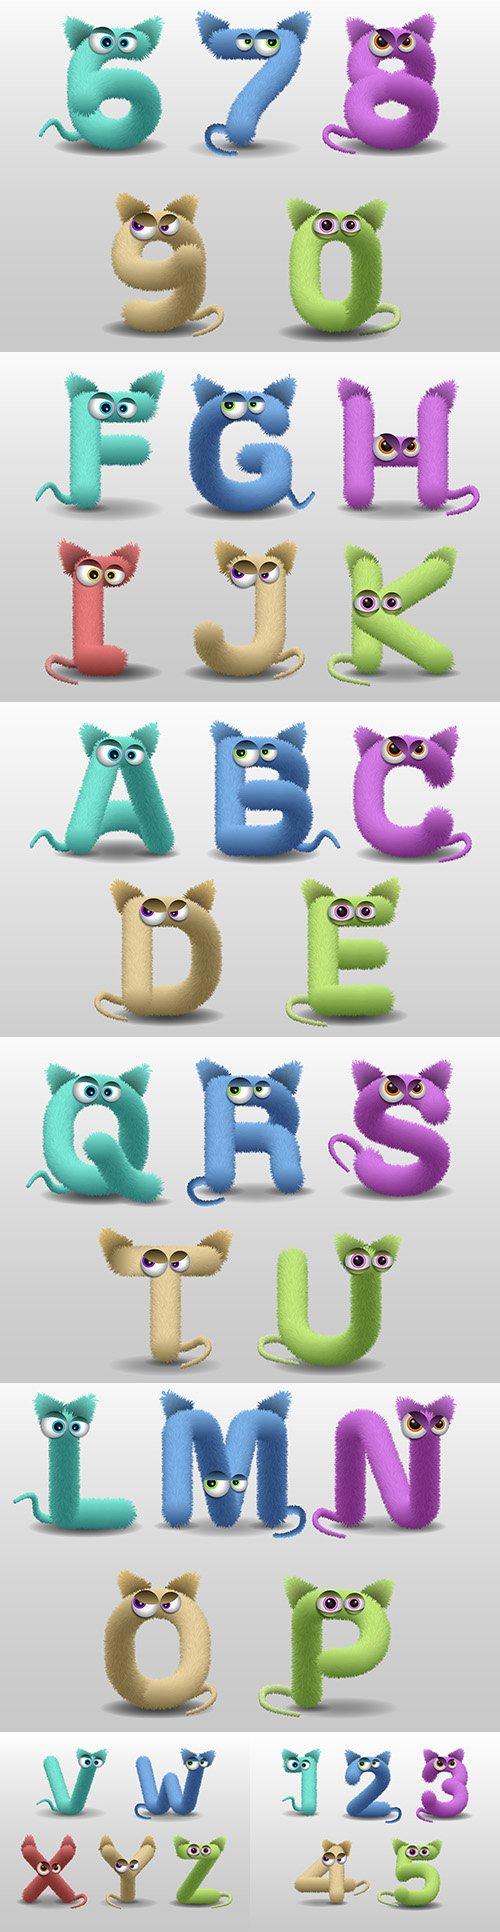 Fur monster cartoon cute alphabet with chicks